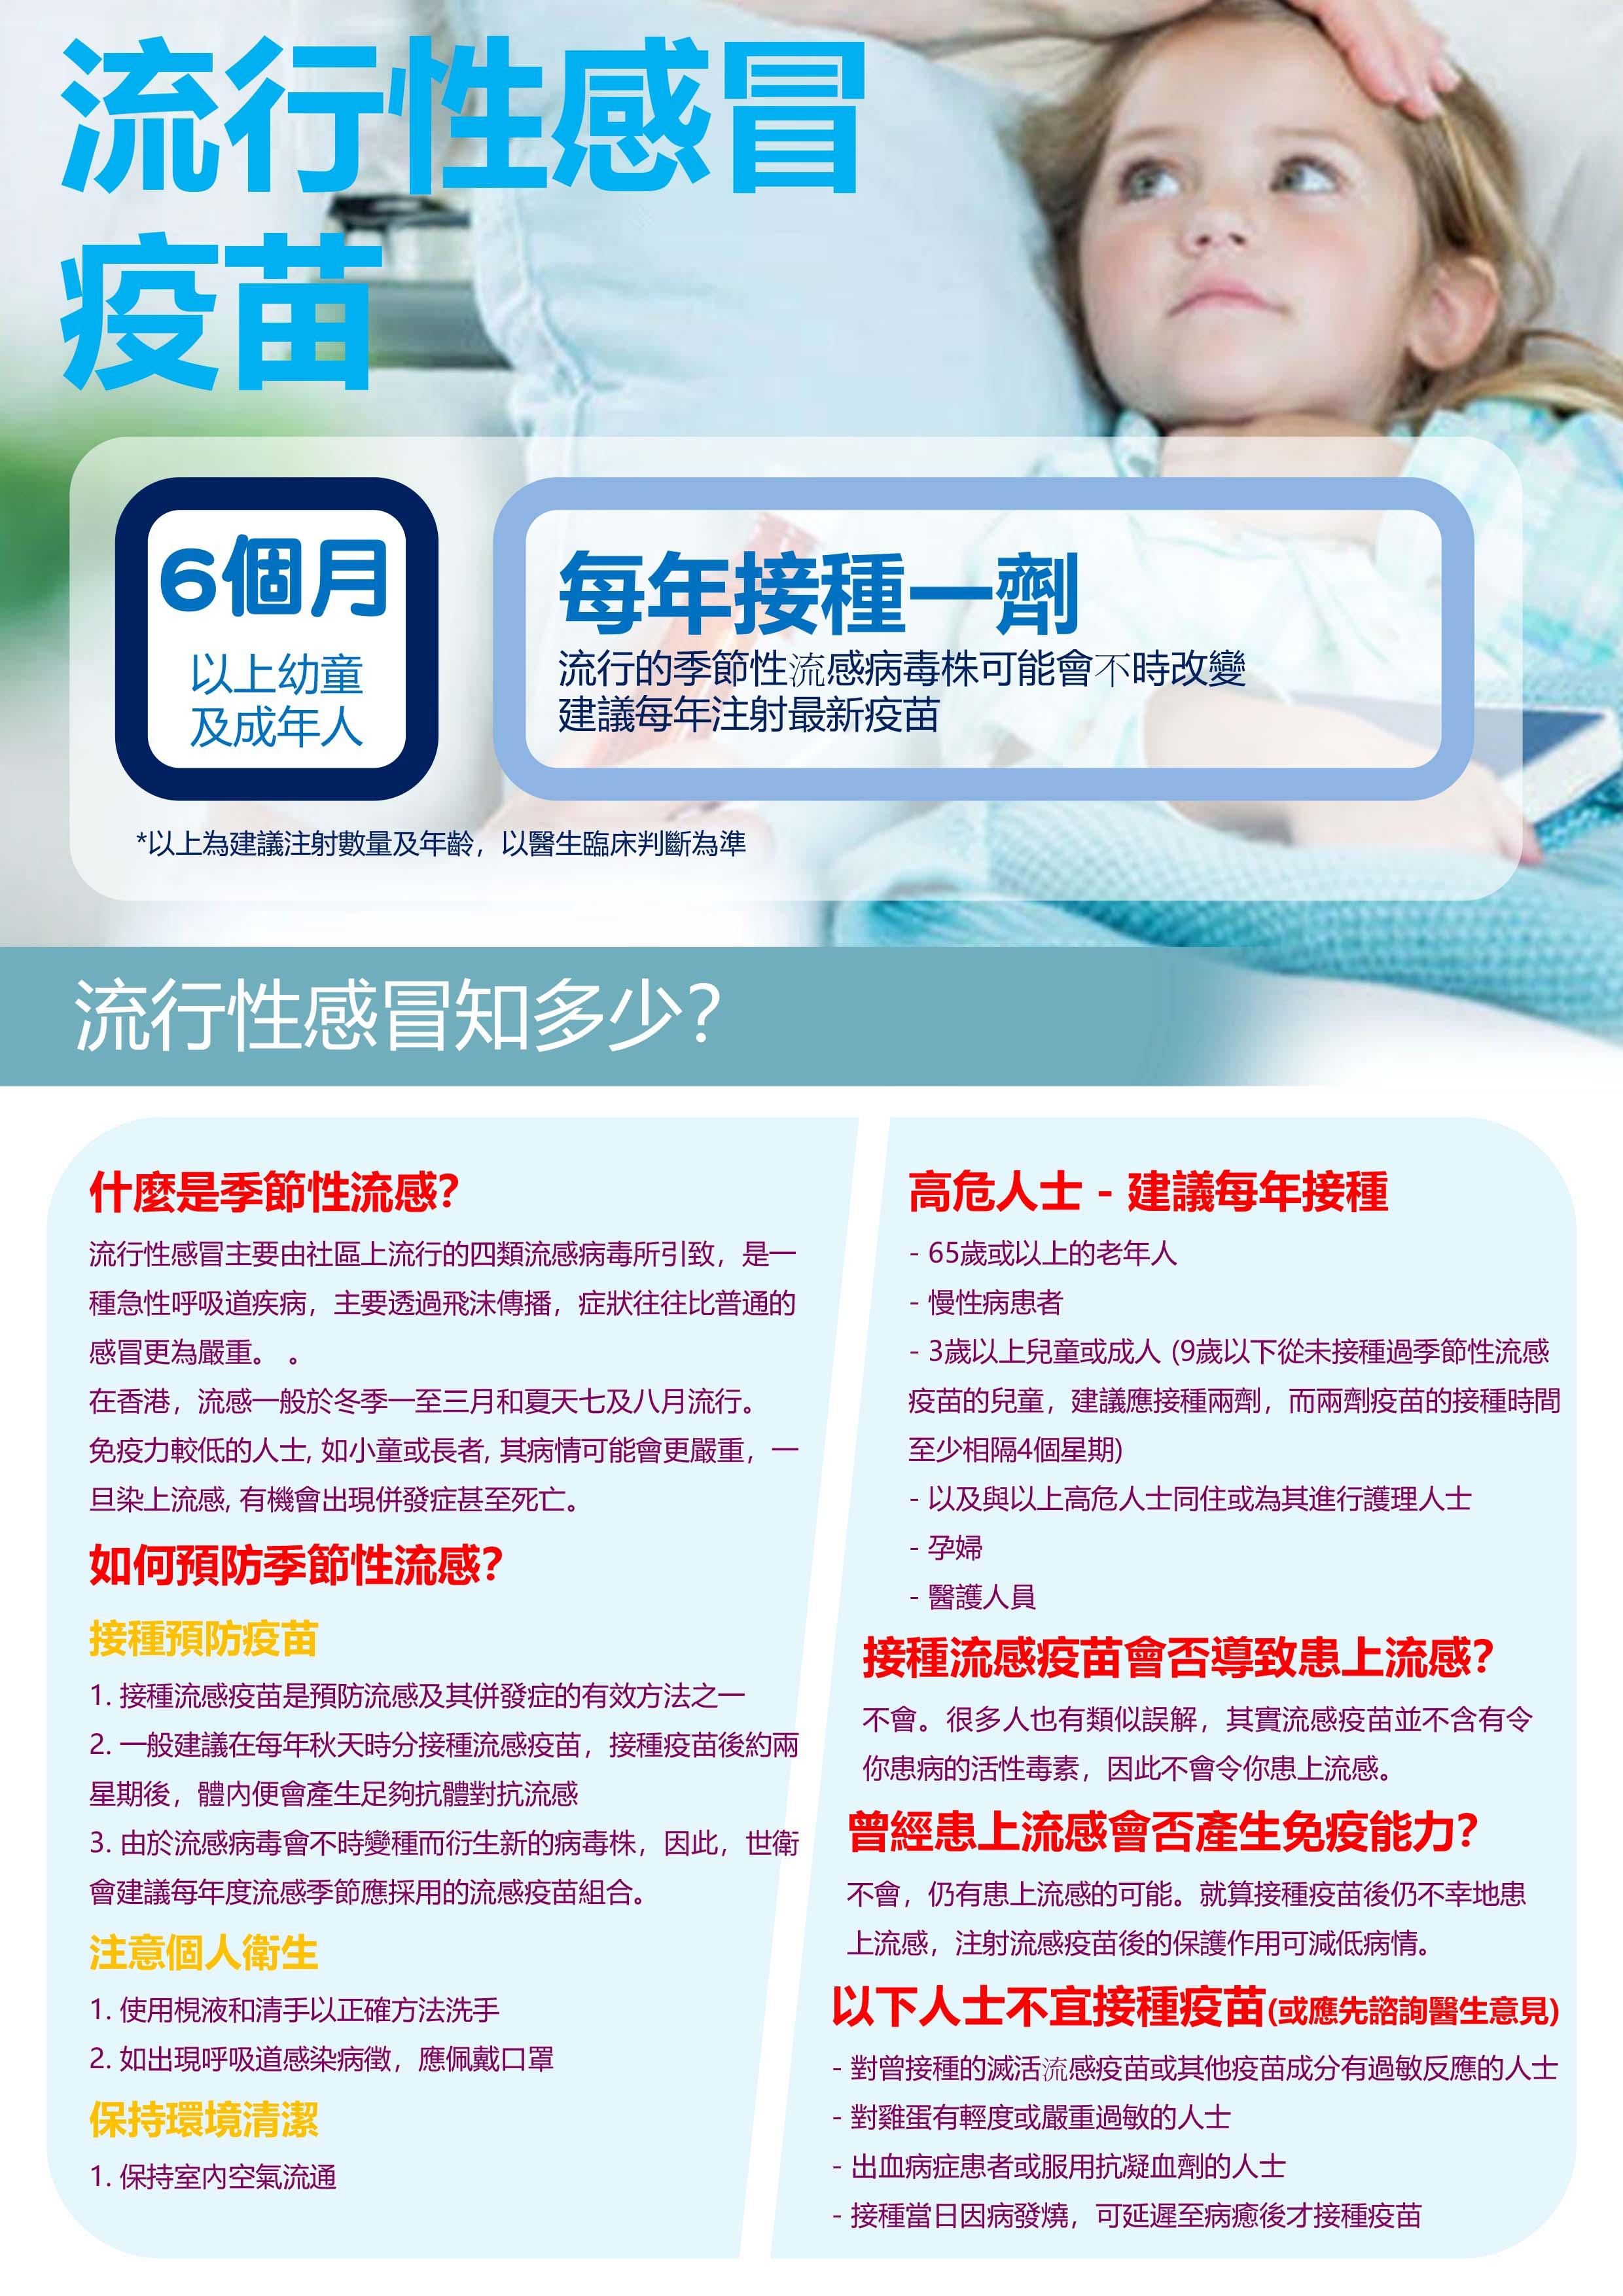 3e-influenza-vaccine-2.jpg